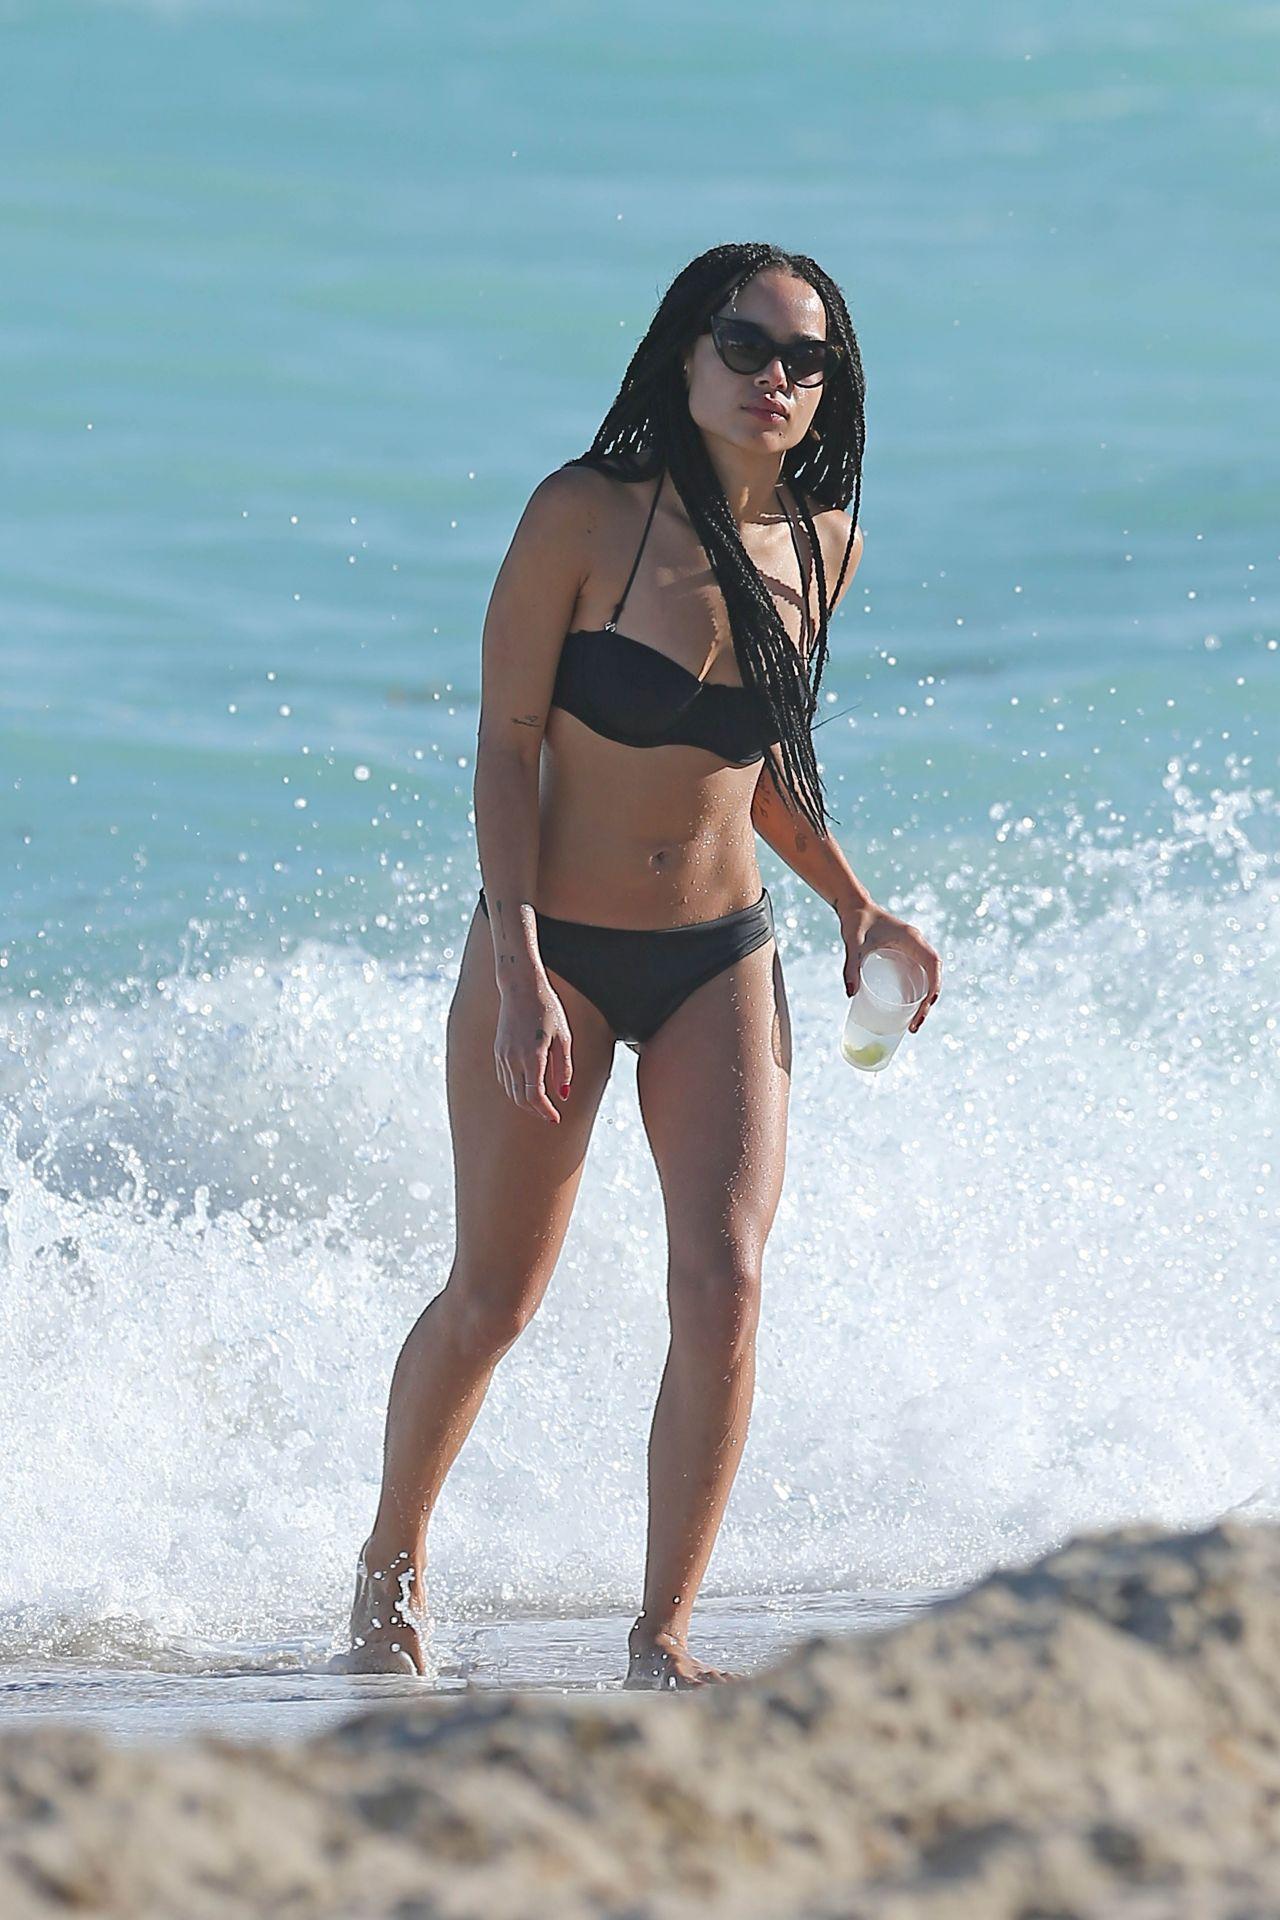 Zoe Kravitz Bikini Candids At Beach In Miami December 2014